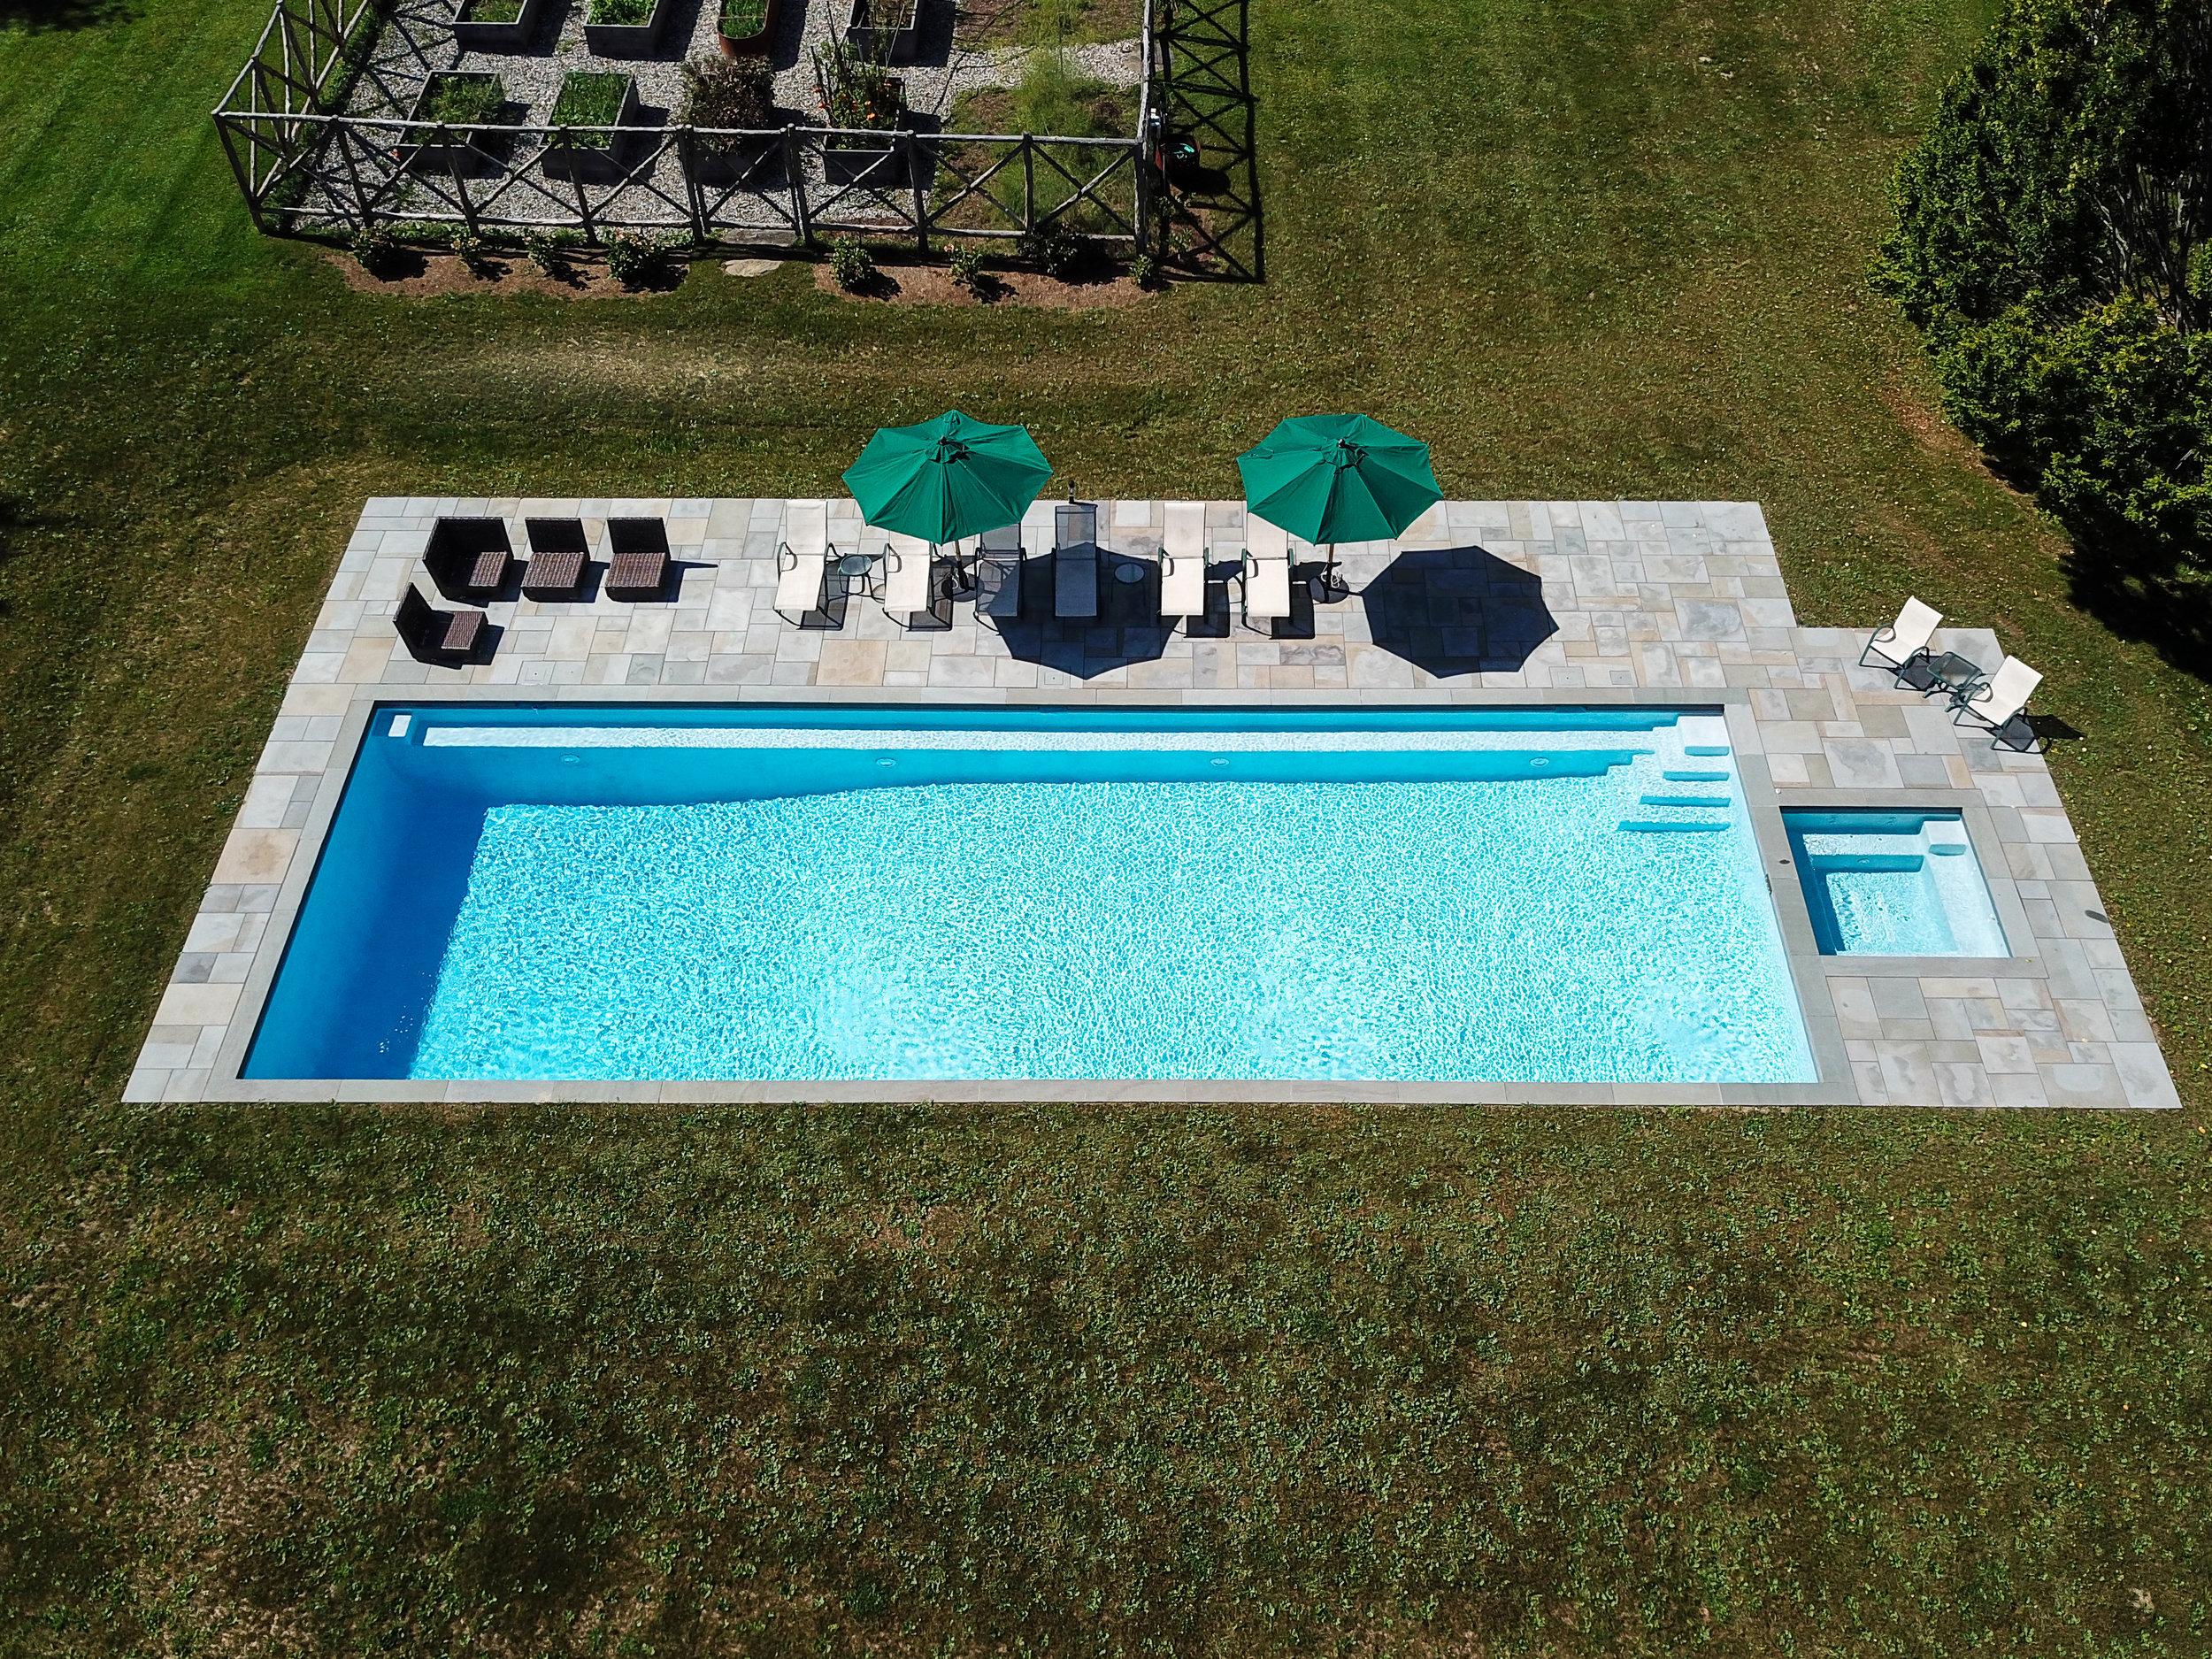 In-ground custom rectangular swimming pool